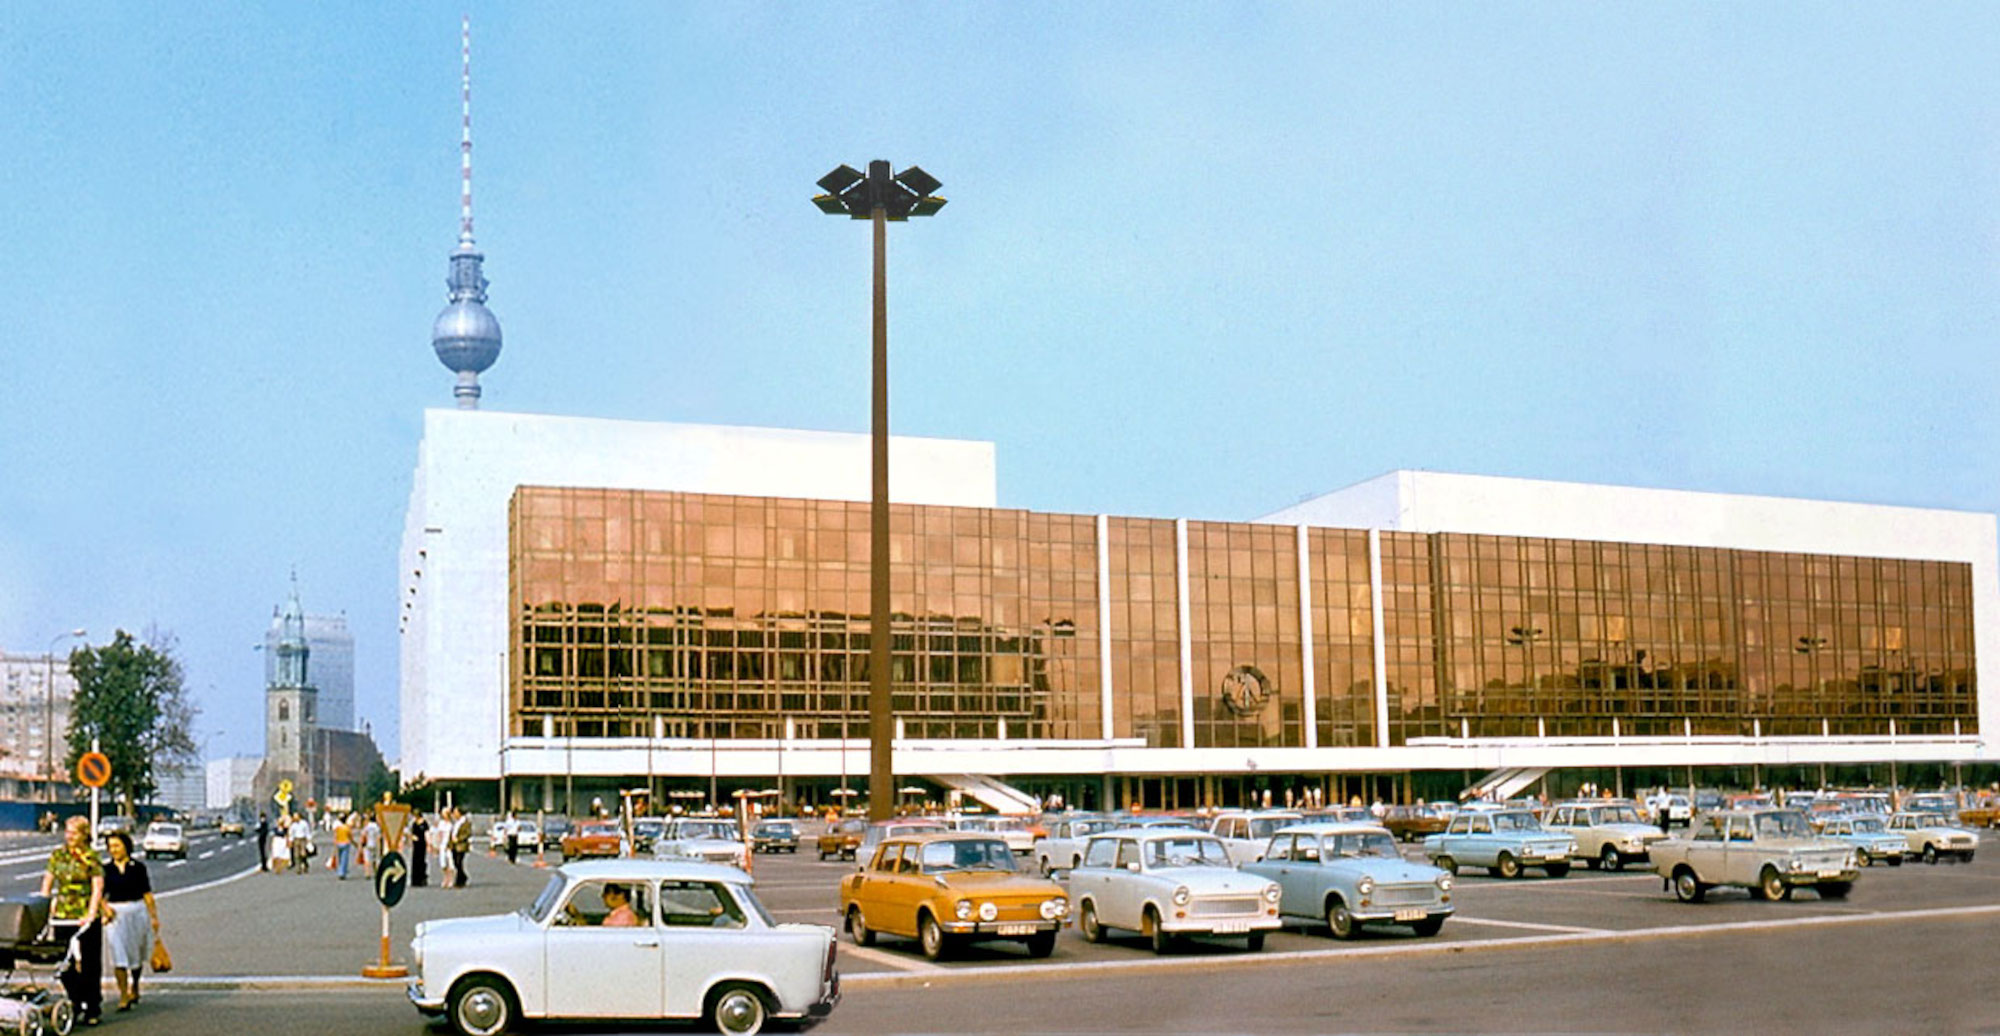 Palast der Republik, 1977. Courtesy: Wikimedia Commons